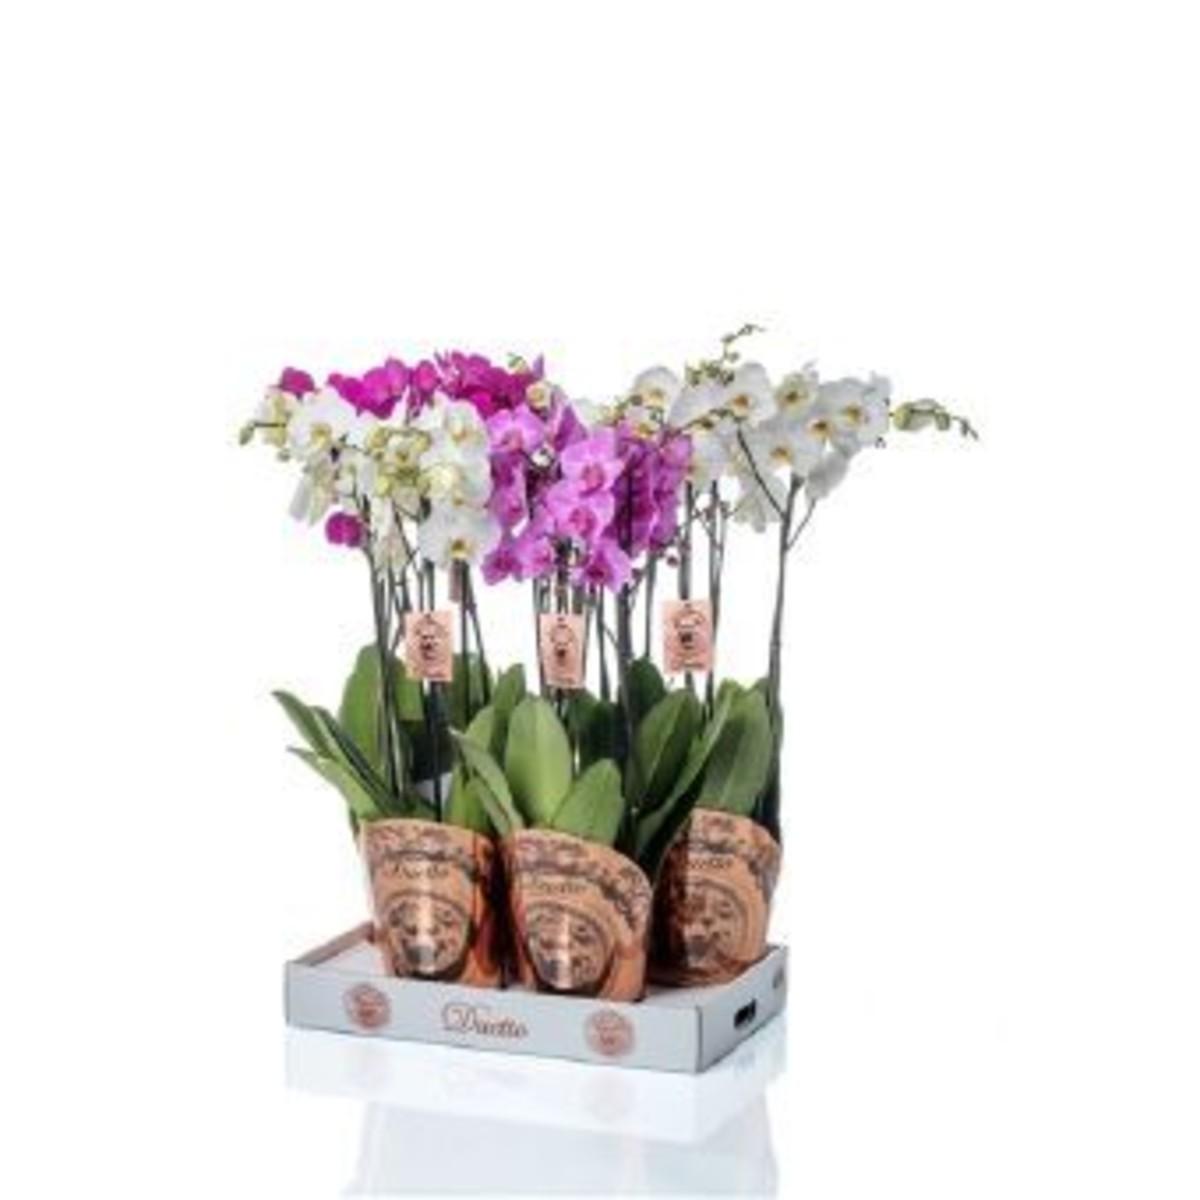 Орхидея Фаленопсис Дуэтто D17 H65